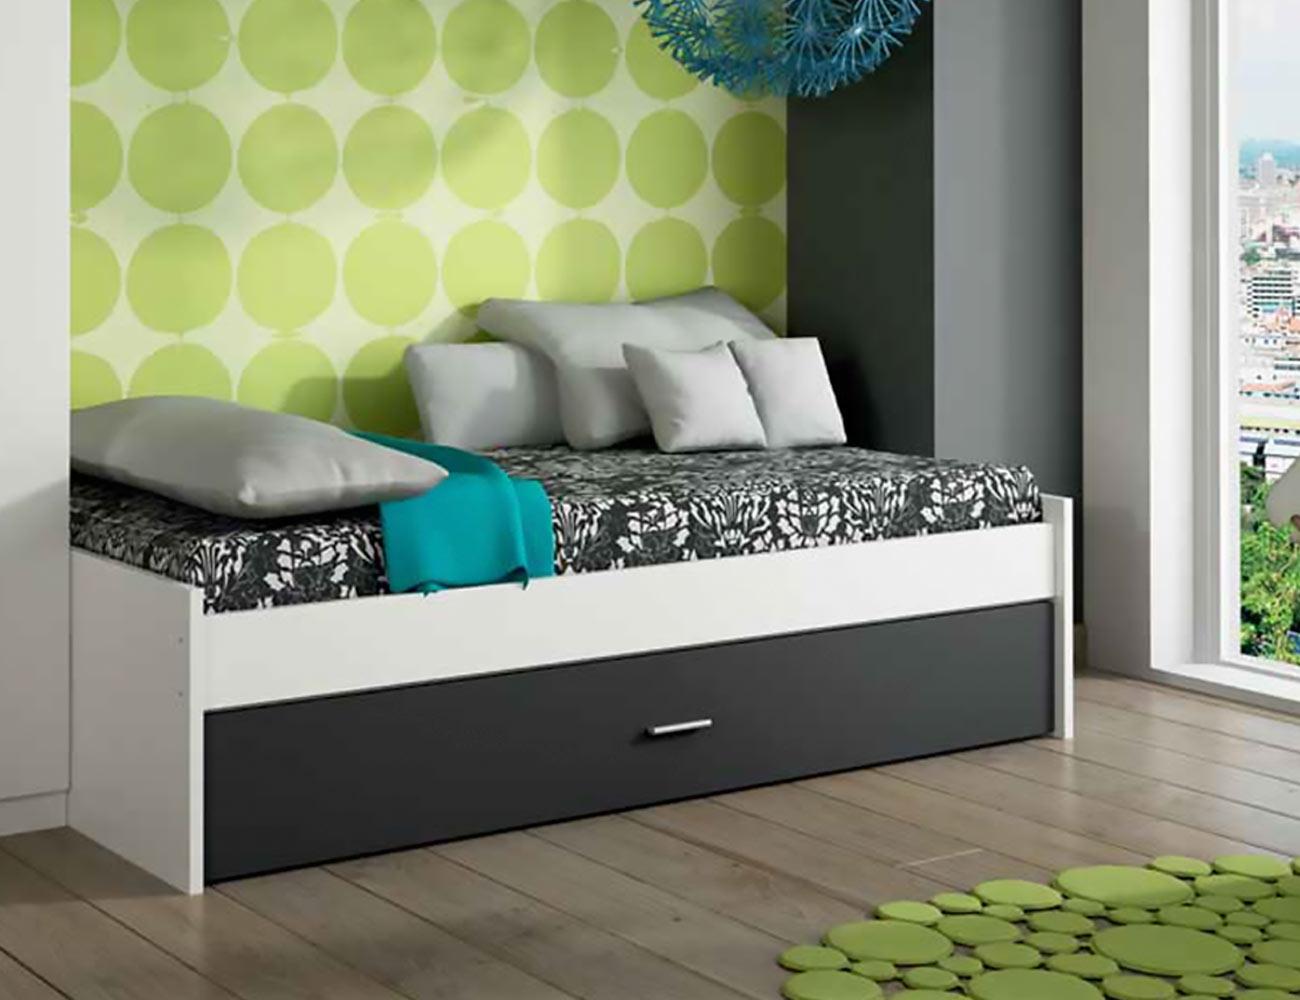 Dormitorio juvenil cama nido blanco grafito